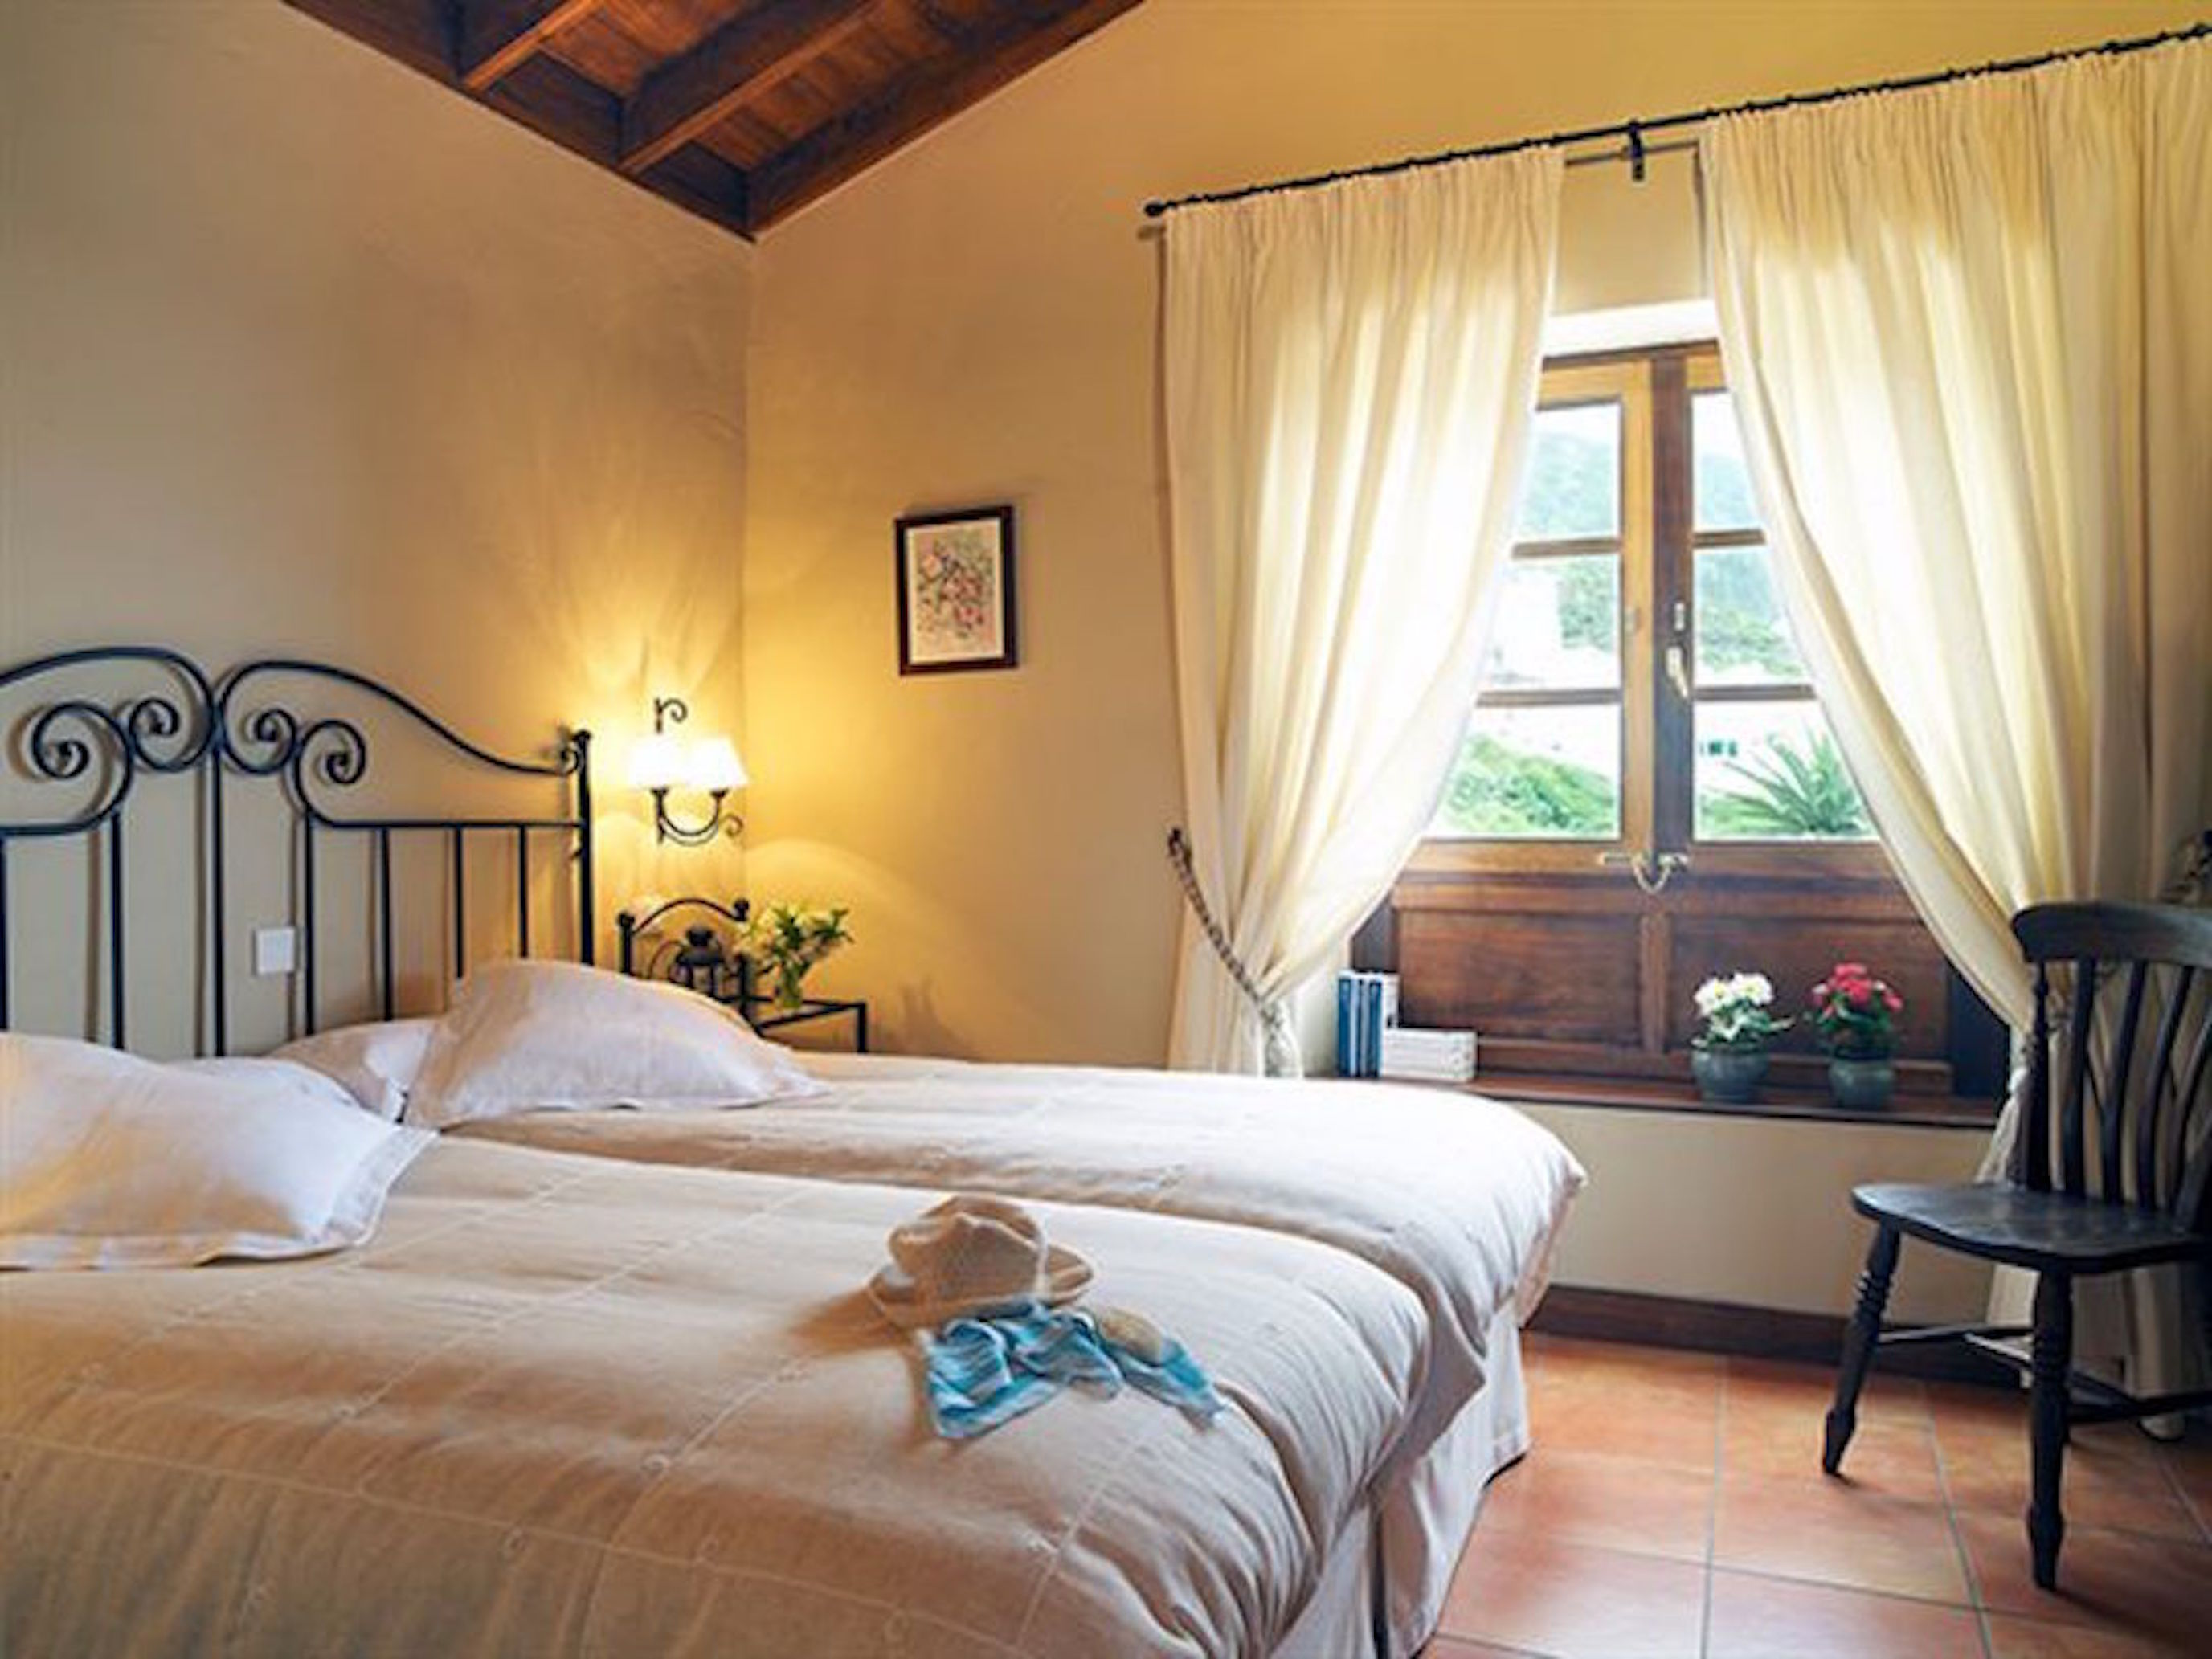 Maison de vacances La Hacienda, Free Wifi Grill (2196689), Garachico, Ténérife, Iles Canaries, Espagne, image 23